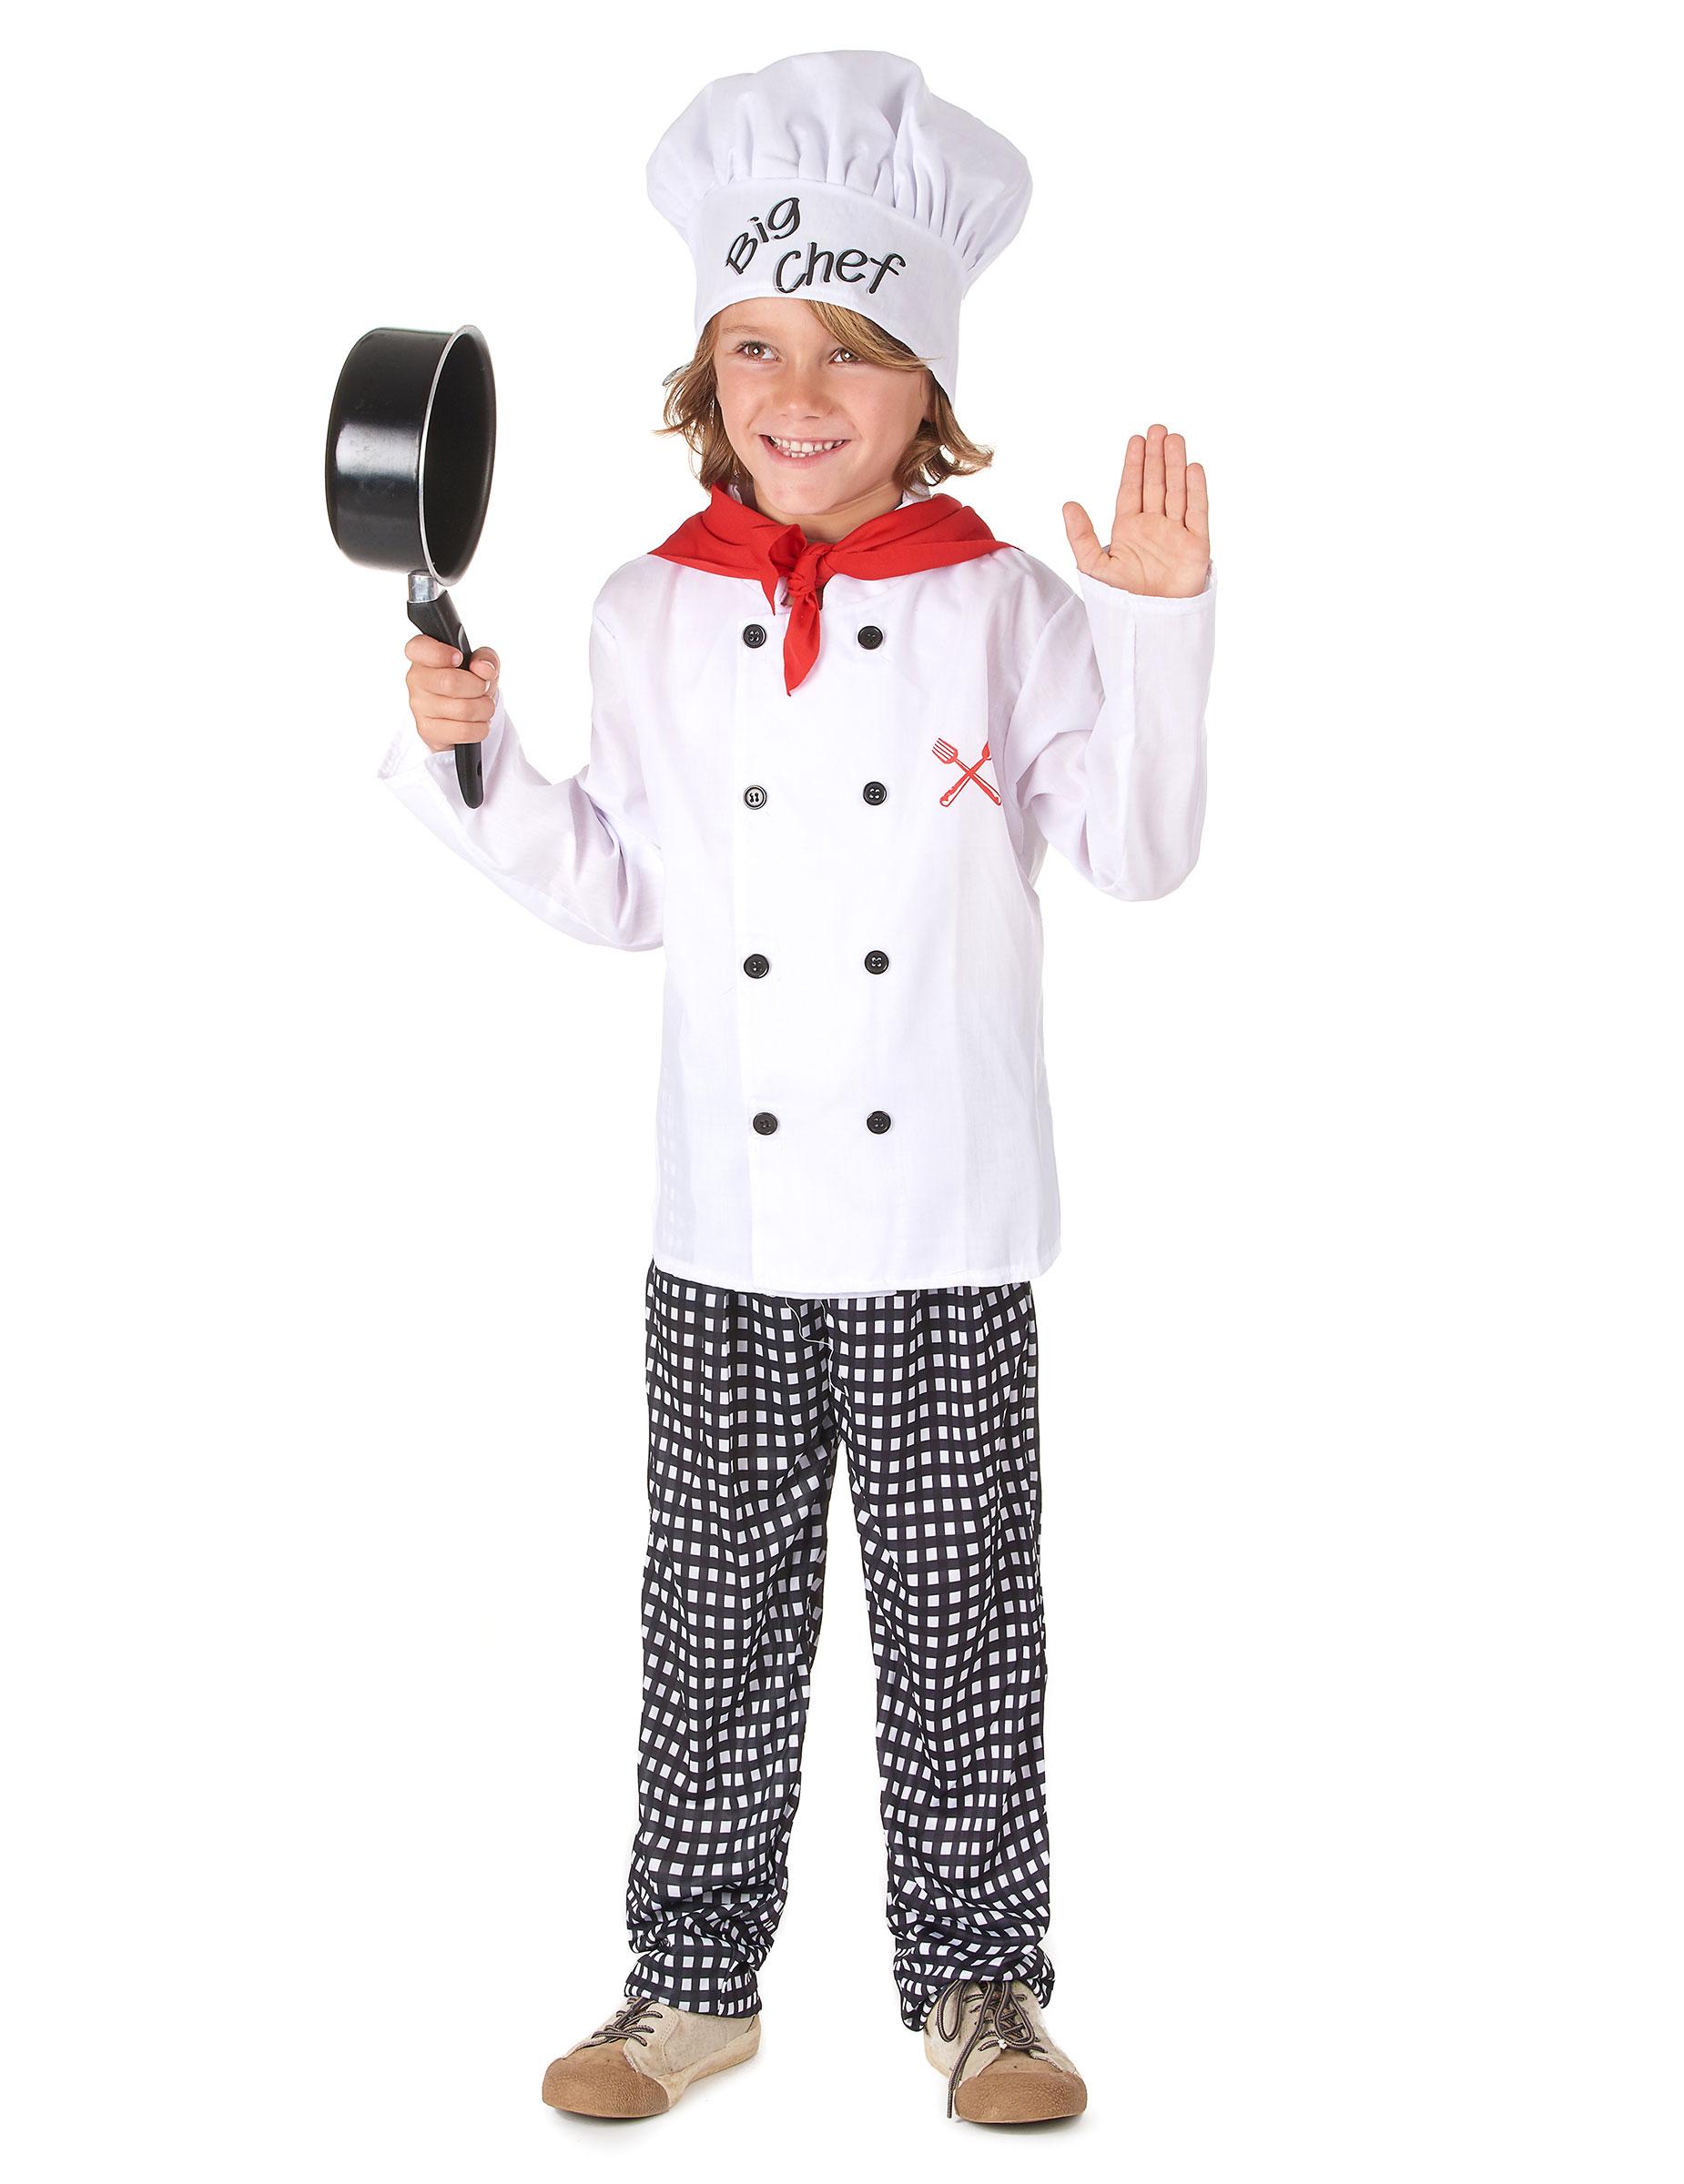 D guisement chef cuisinier gar on deguise toi achat de for Cuisinier 49